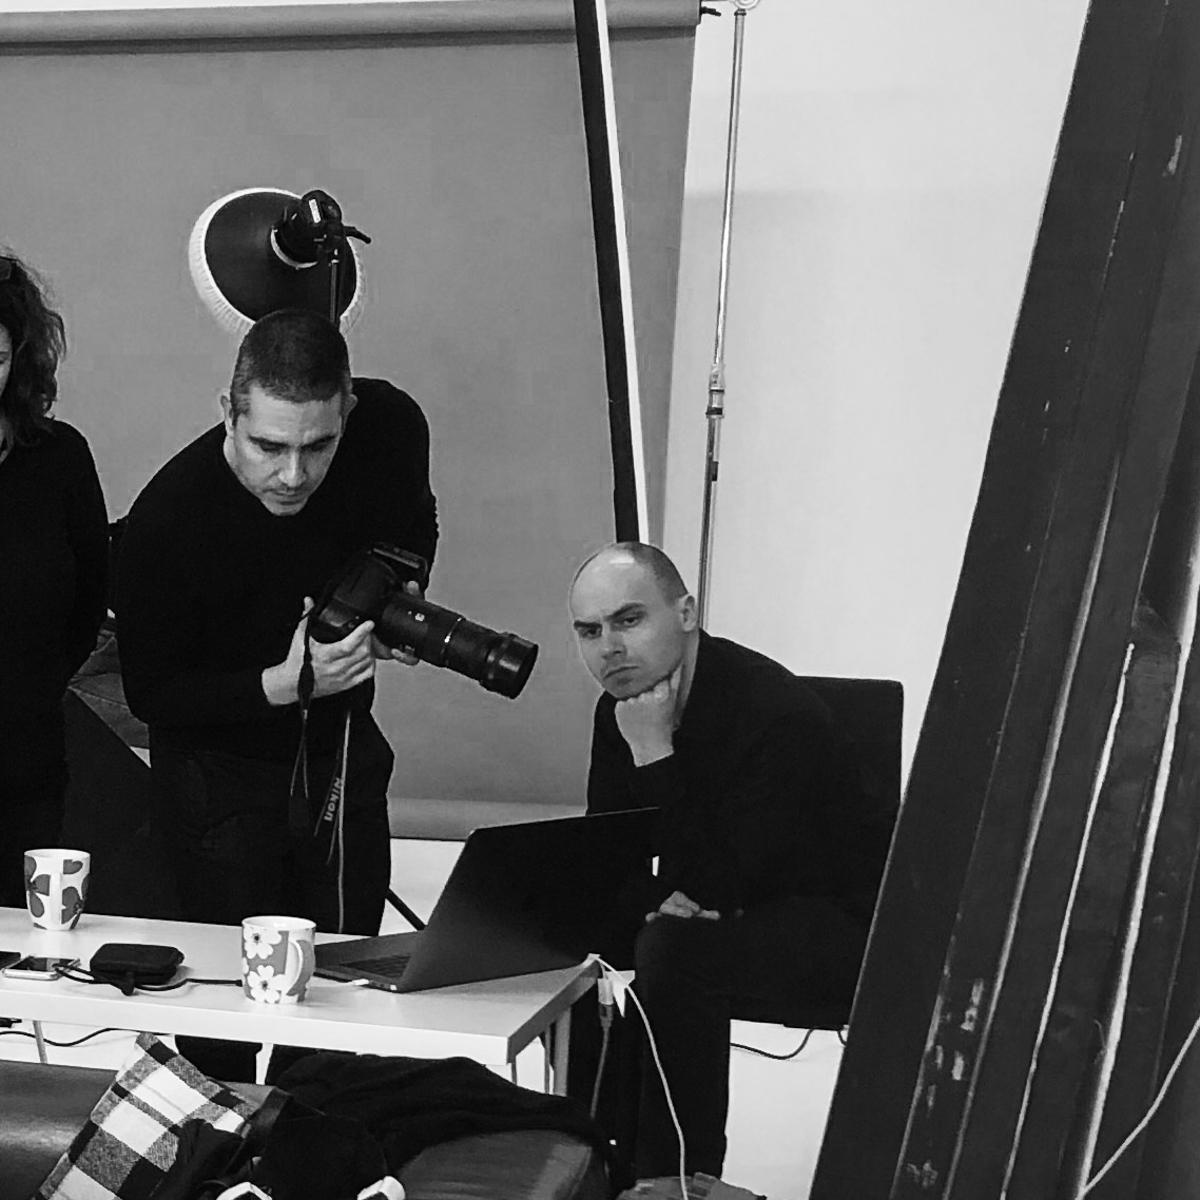 London-photographer-JC-Candanedo-Grey-Pistachio-Fashion-Corporate-Portraits-Headshots-Blog-Creative-Industry-London-borrow-funding-round.jpg